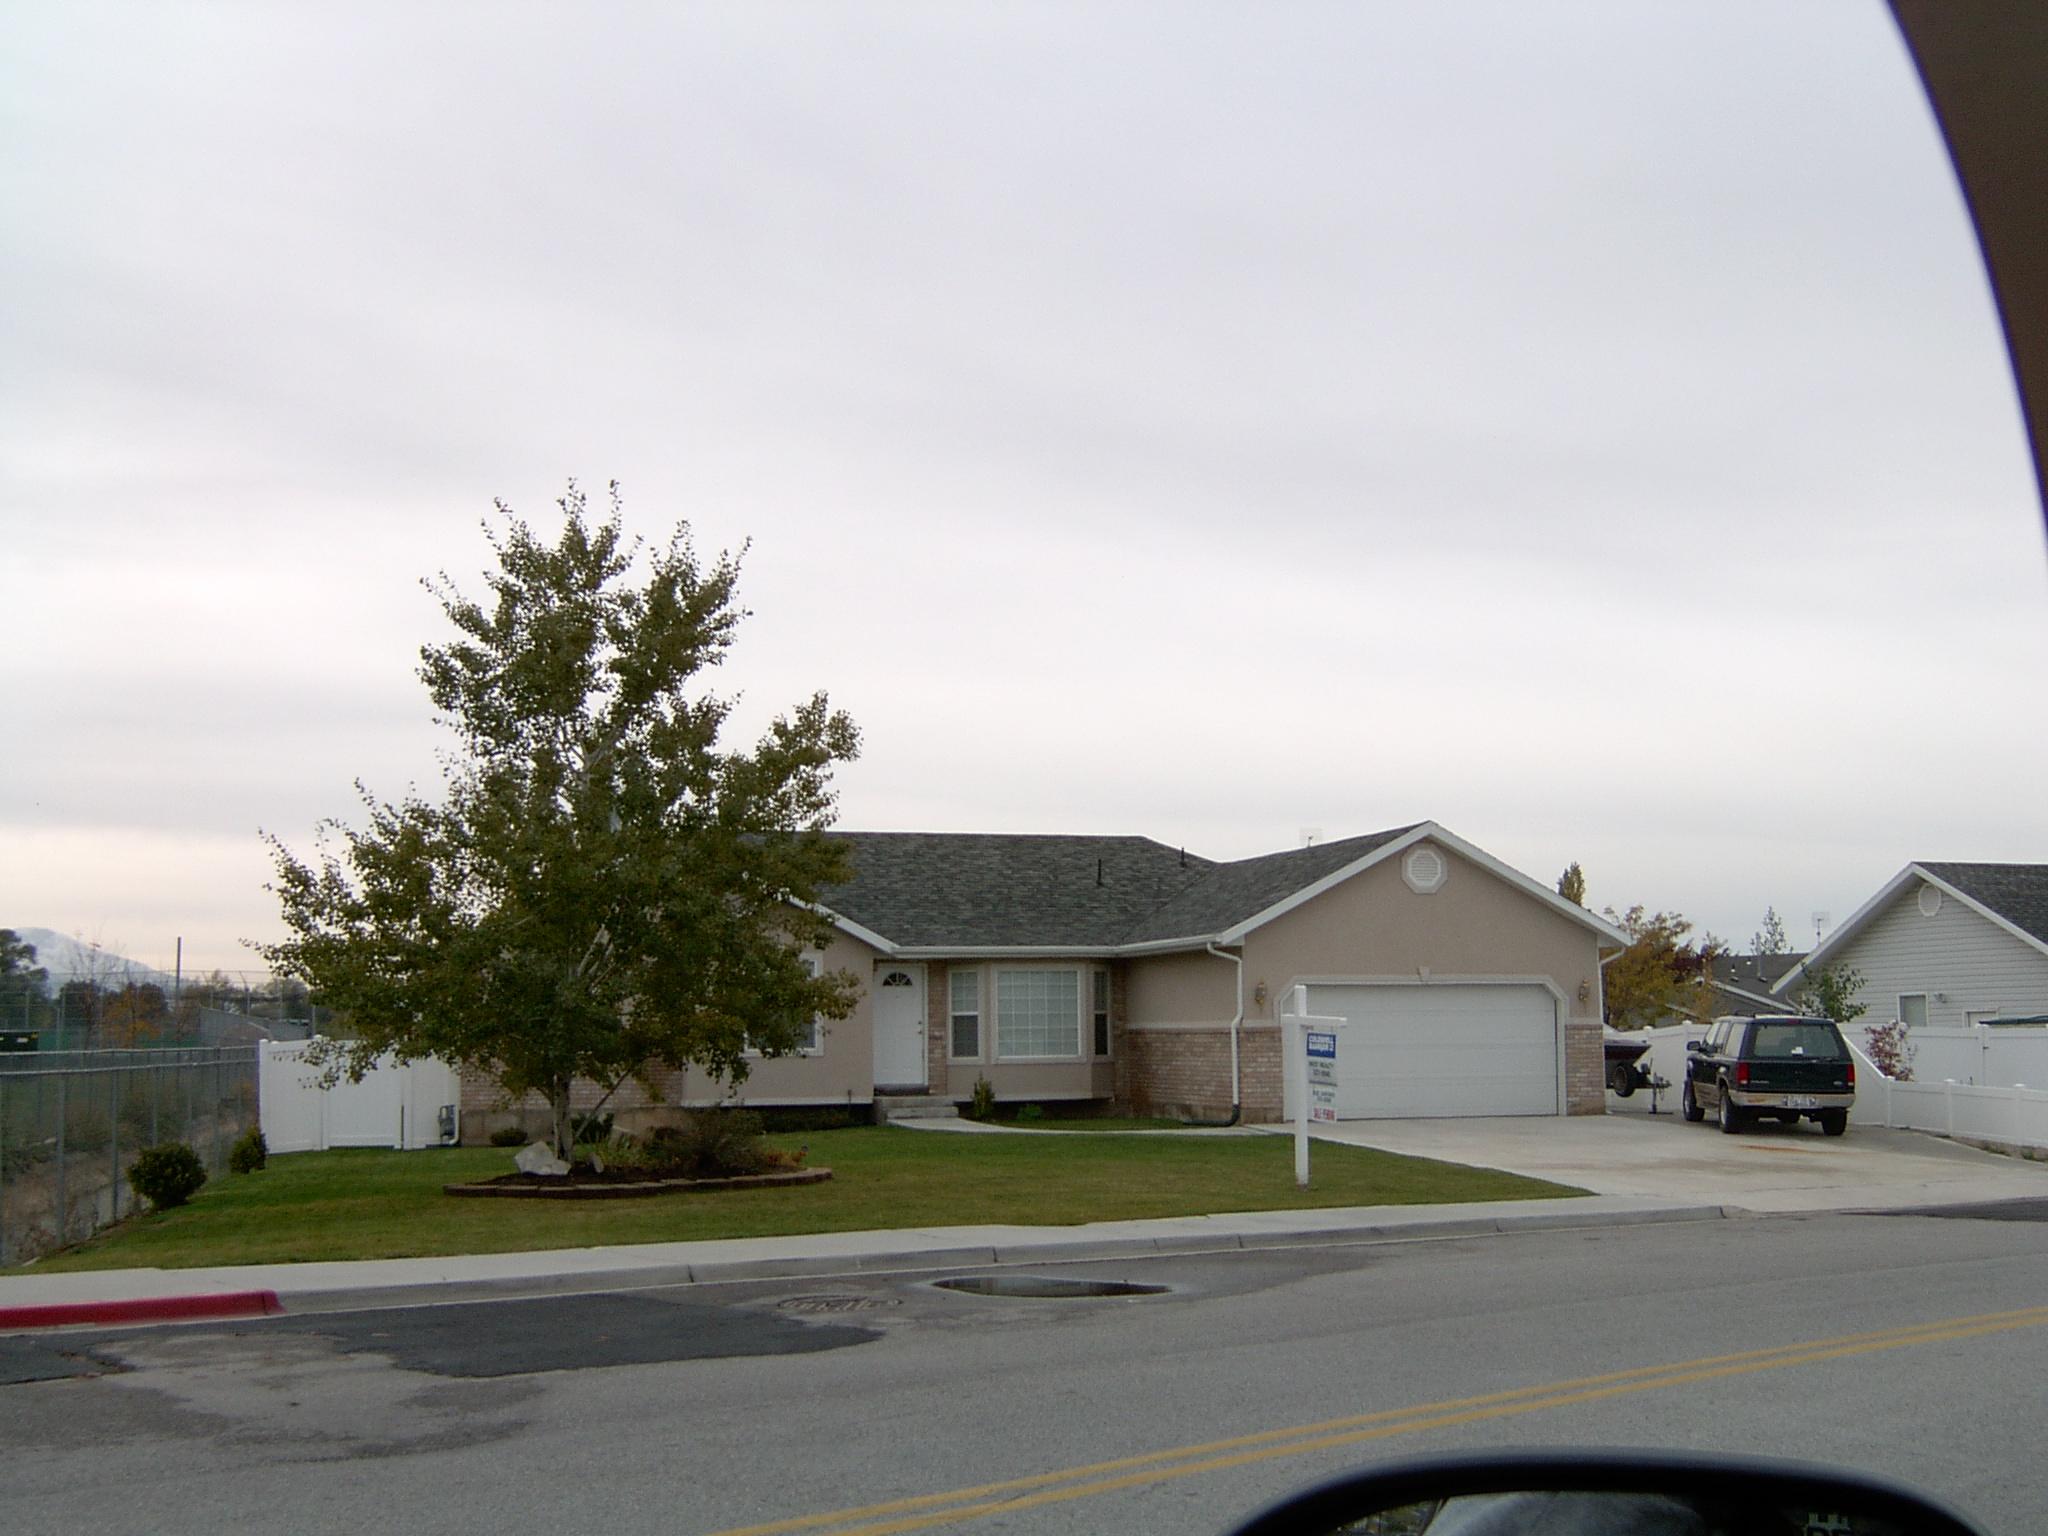 2004-1447P.JPG